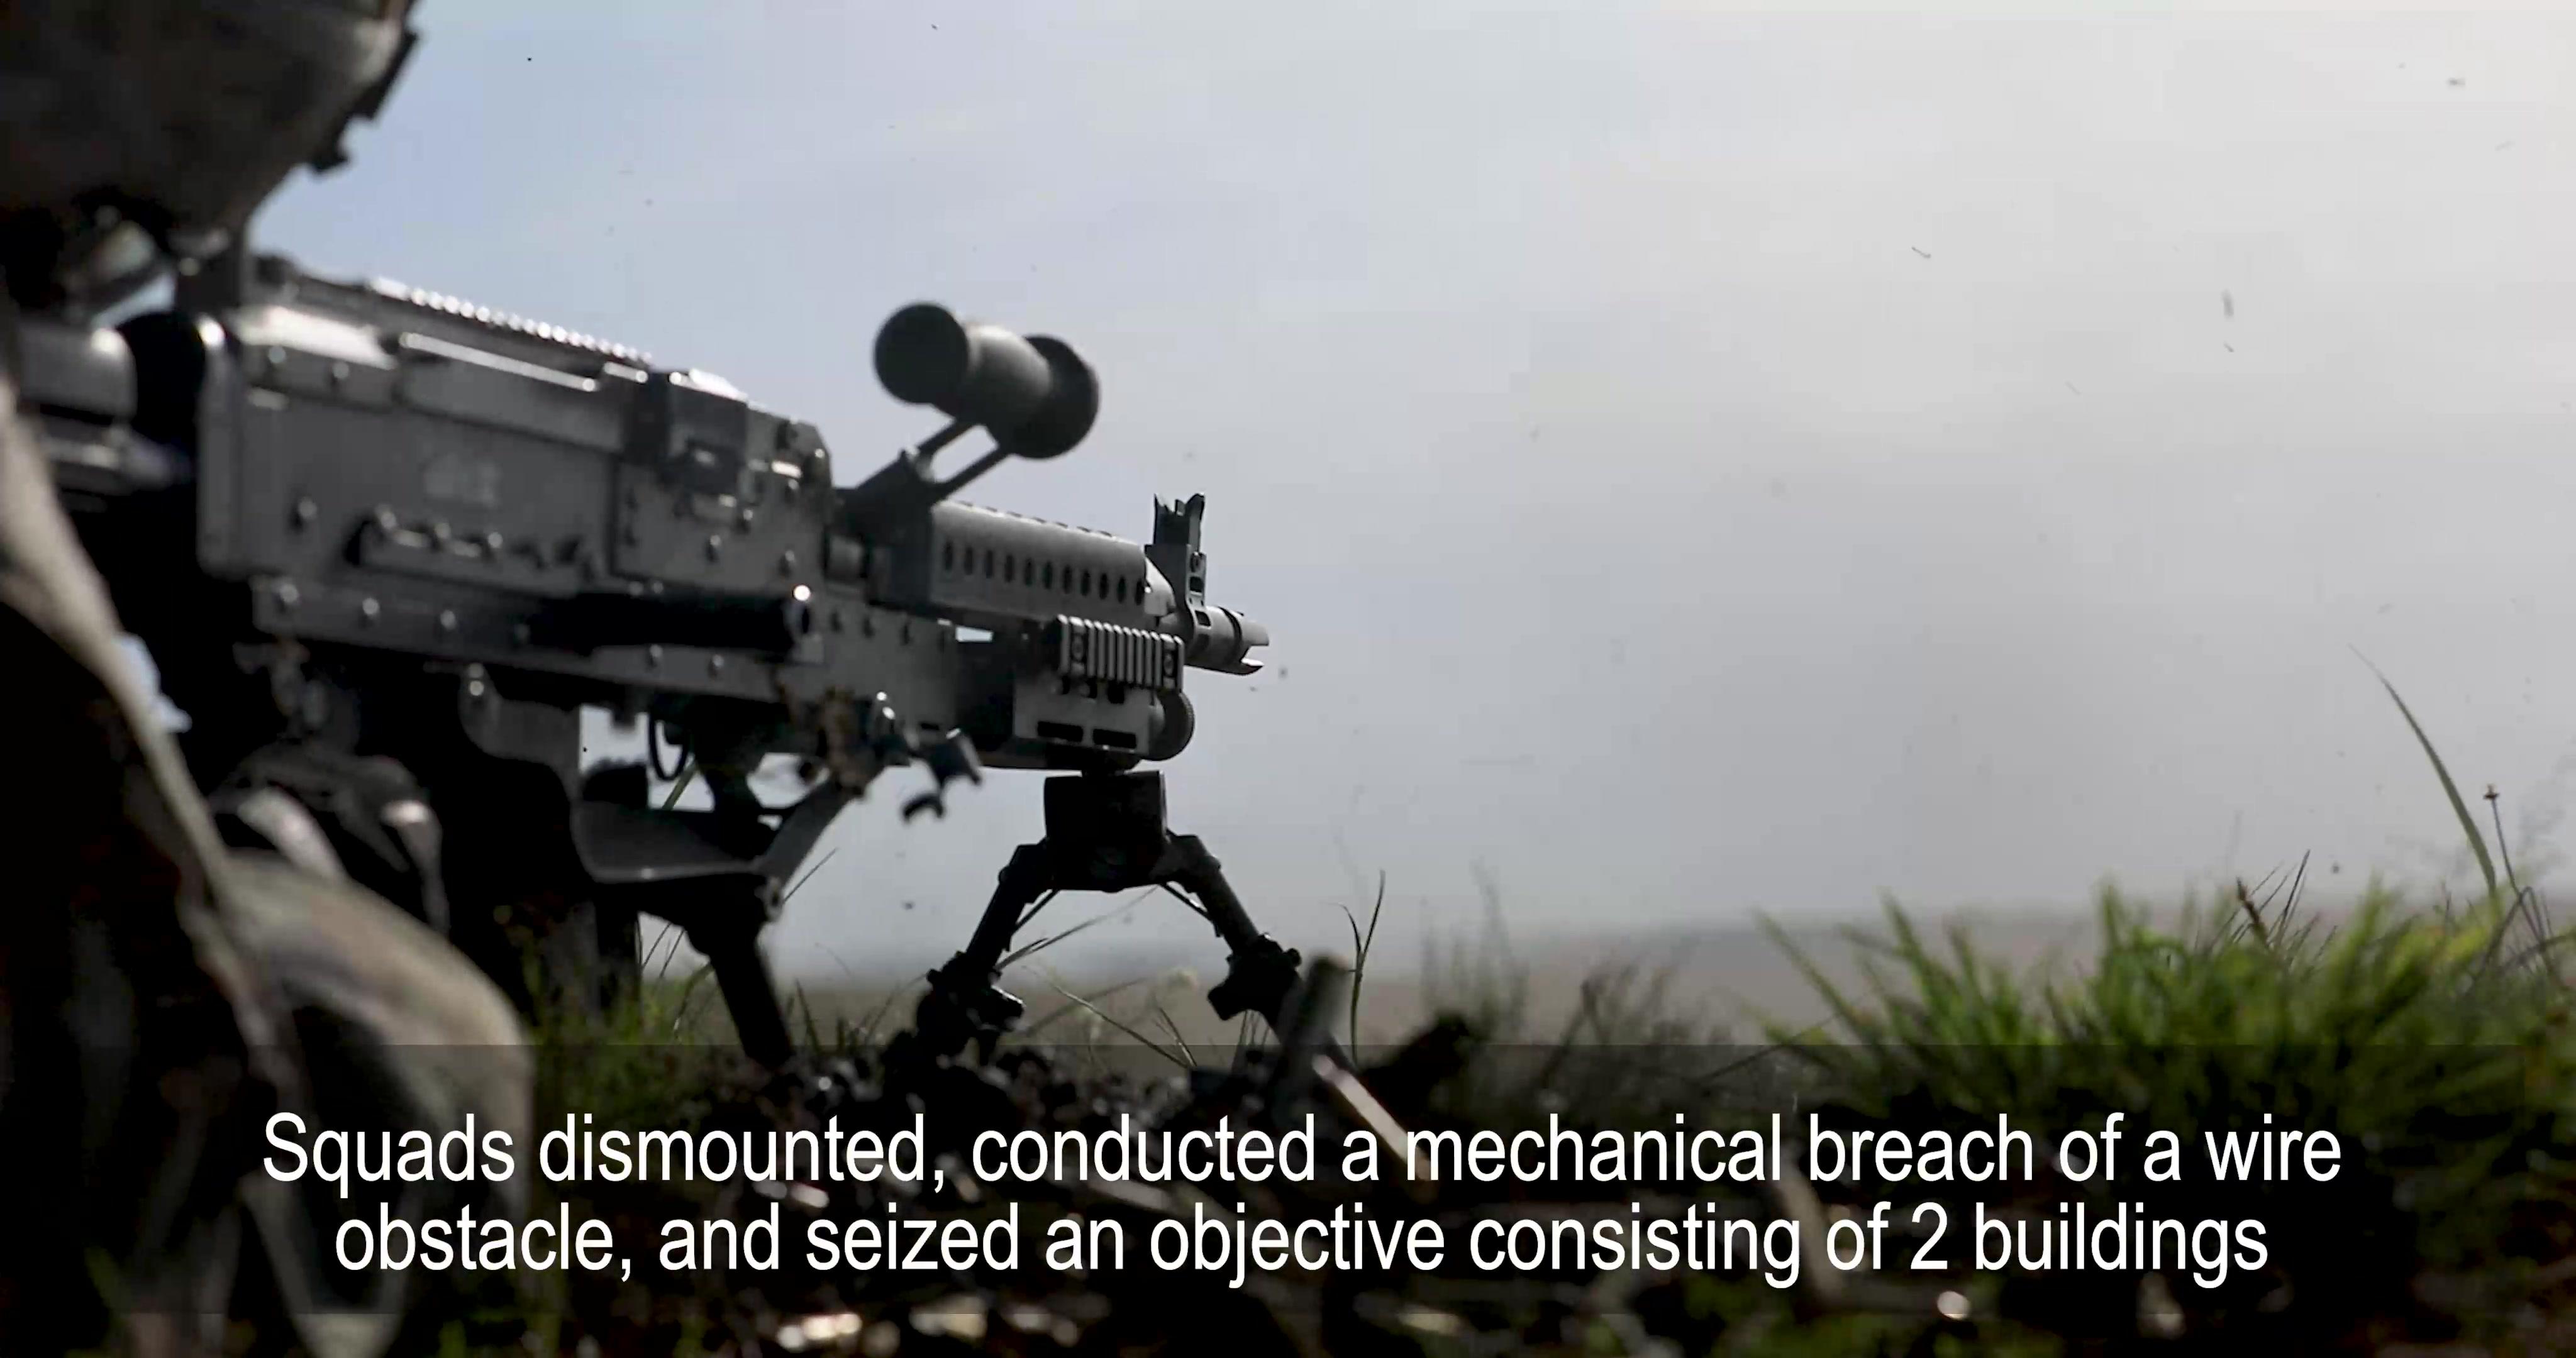 Fighting Aces conduct platoon live-fire at Bucierz range, DPTA